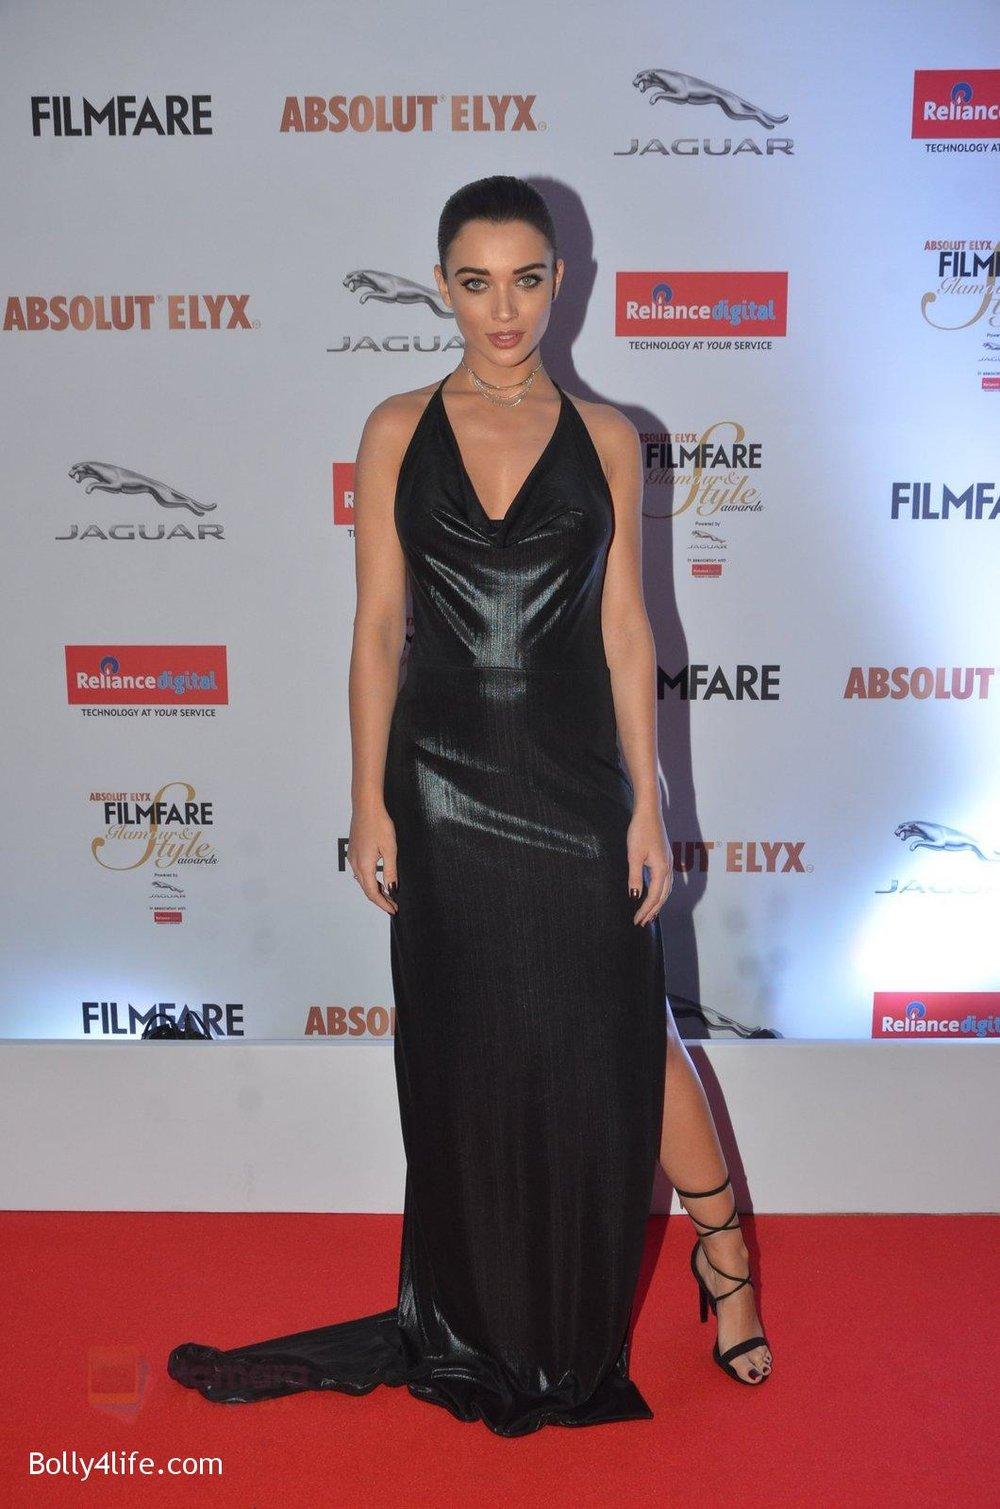 Amy-Jackson-at-Filmfare-Glamour-Style-Awards-2016-in-Mumbai-on-15th-Oct-2016-1433.jpg